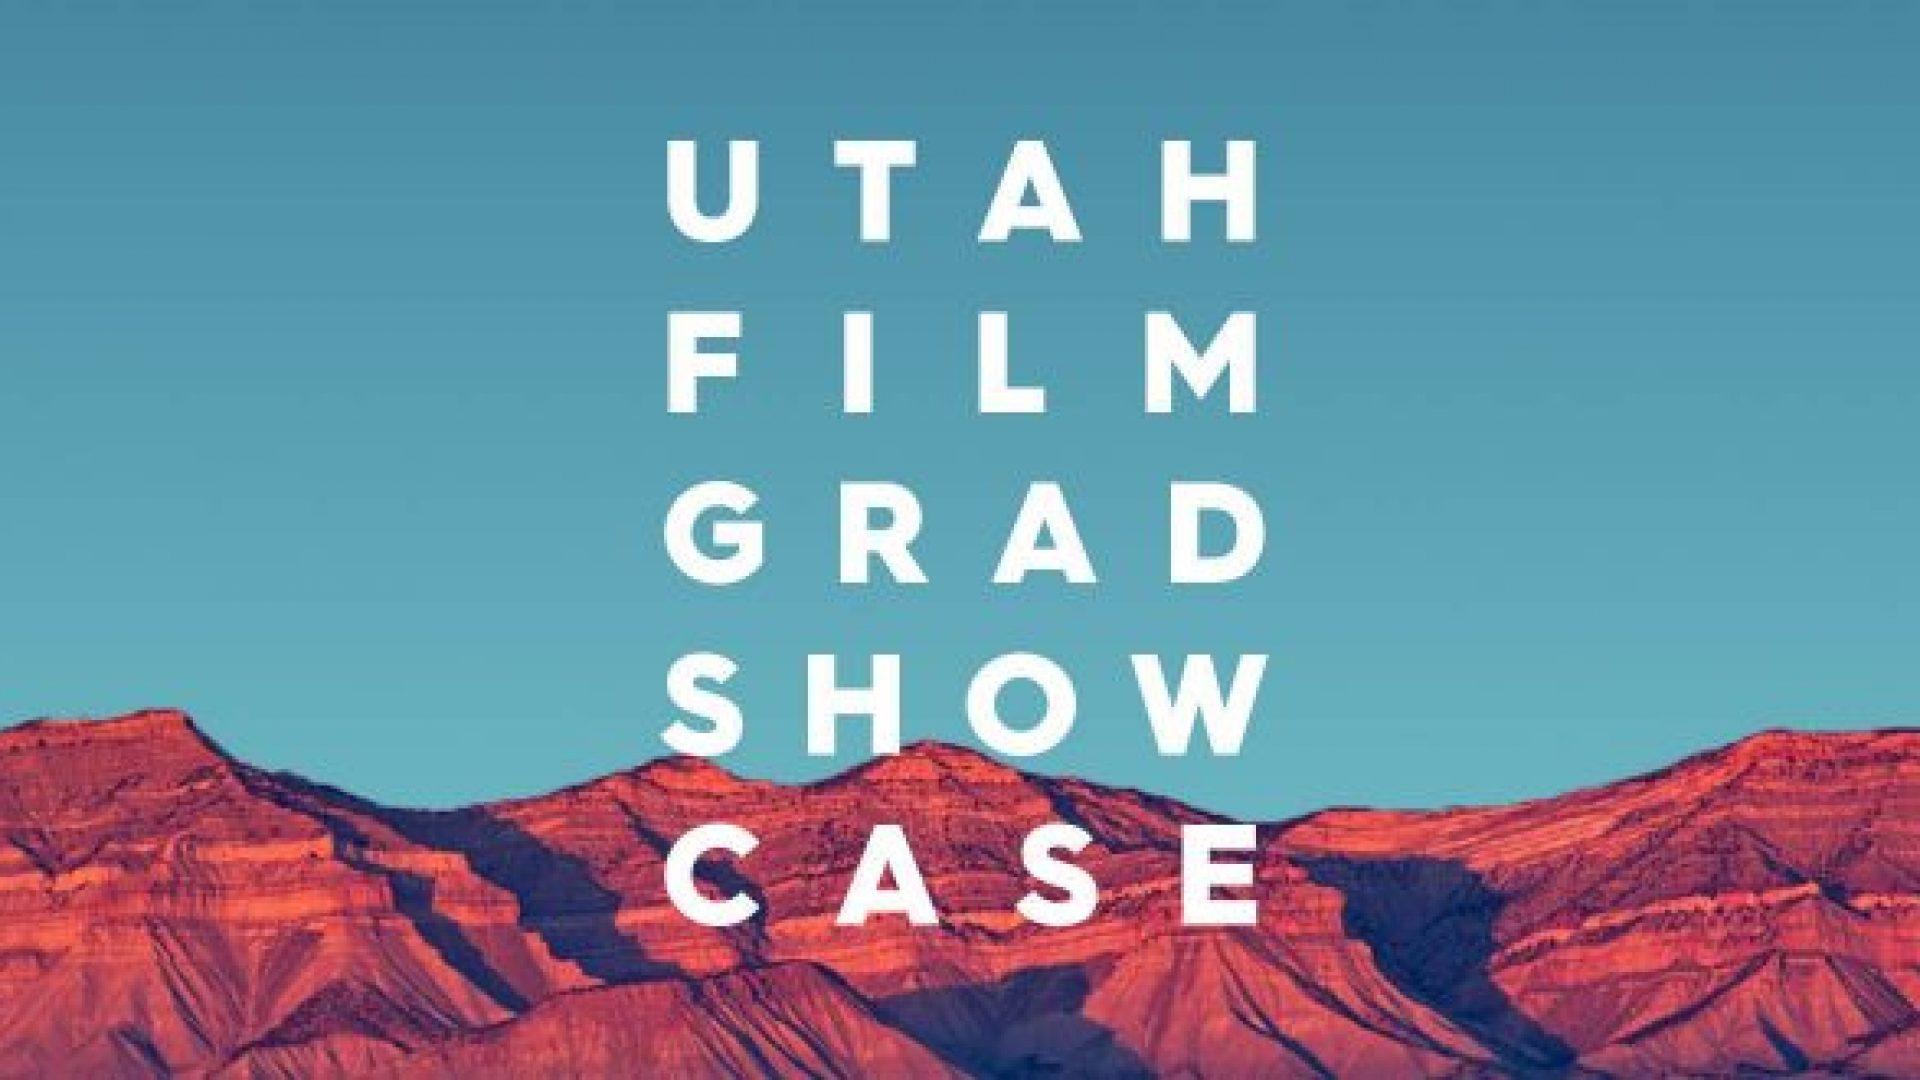 UtahFilmGradShowcase2018_Website